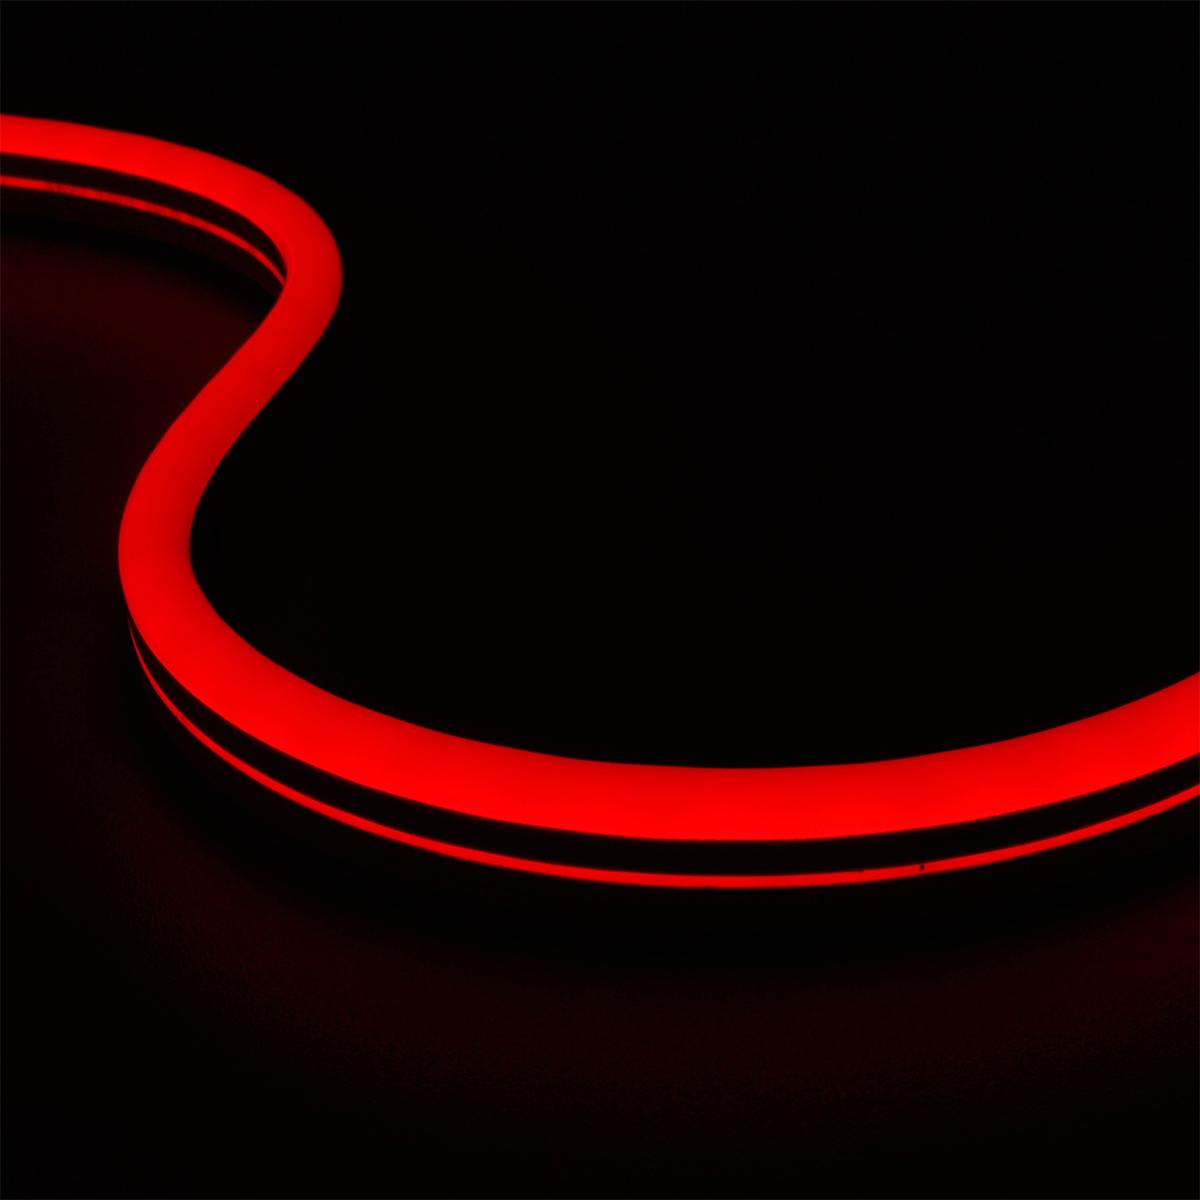 Neon Rot 24V LED Streifen 5M 10W/m 84LED/m 7mm IP65